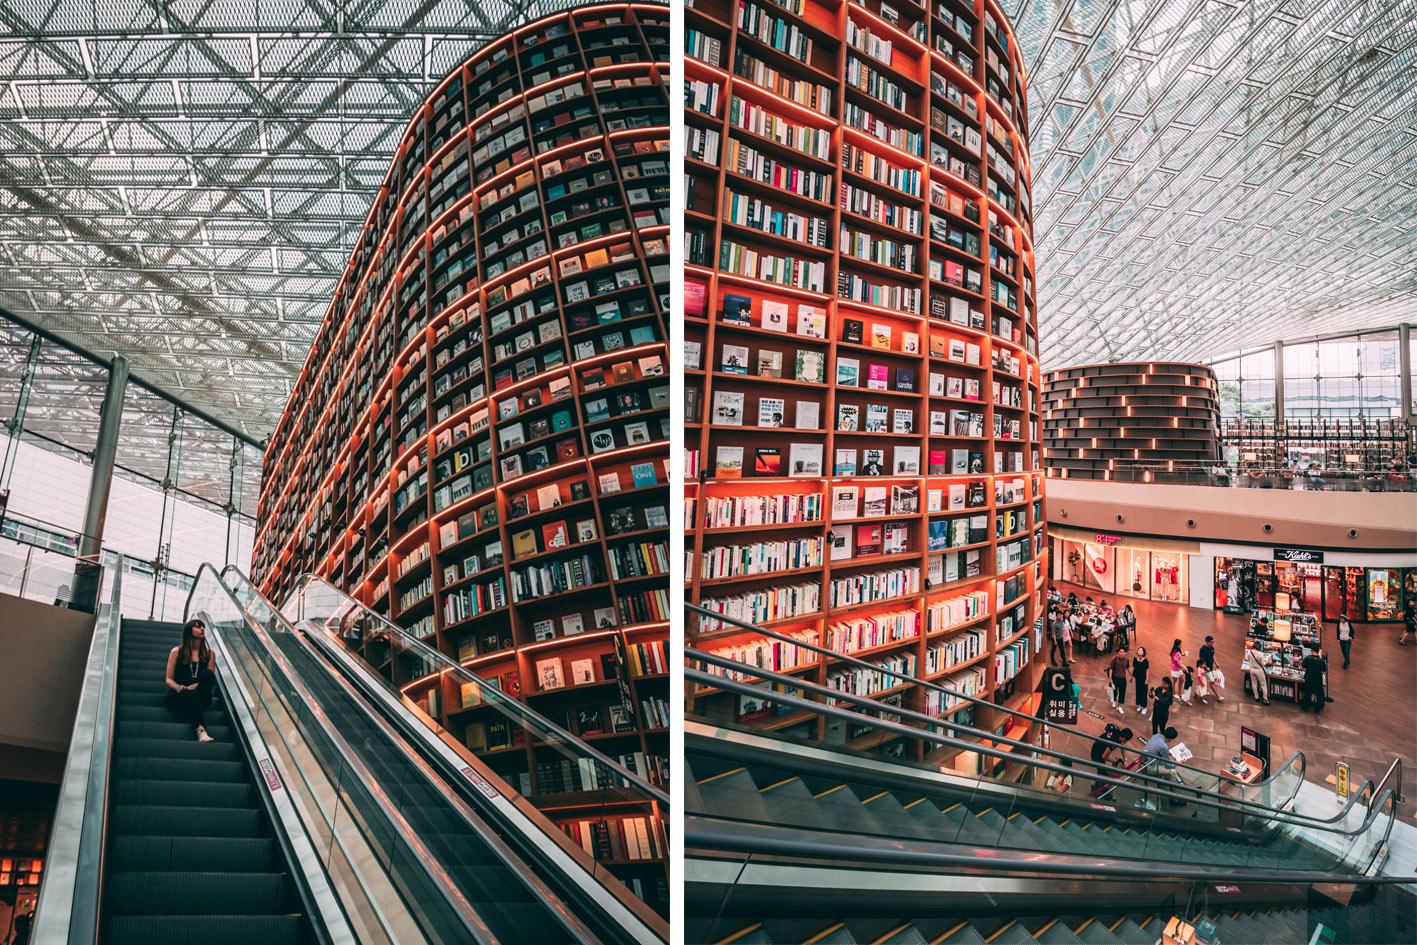 librairie Starfield Séoul